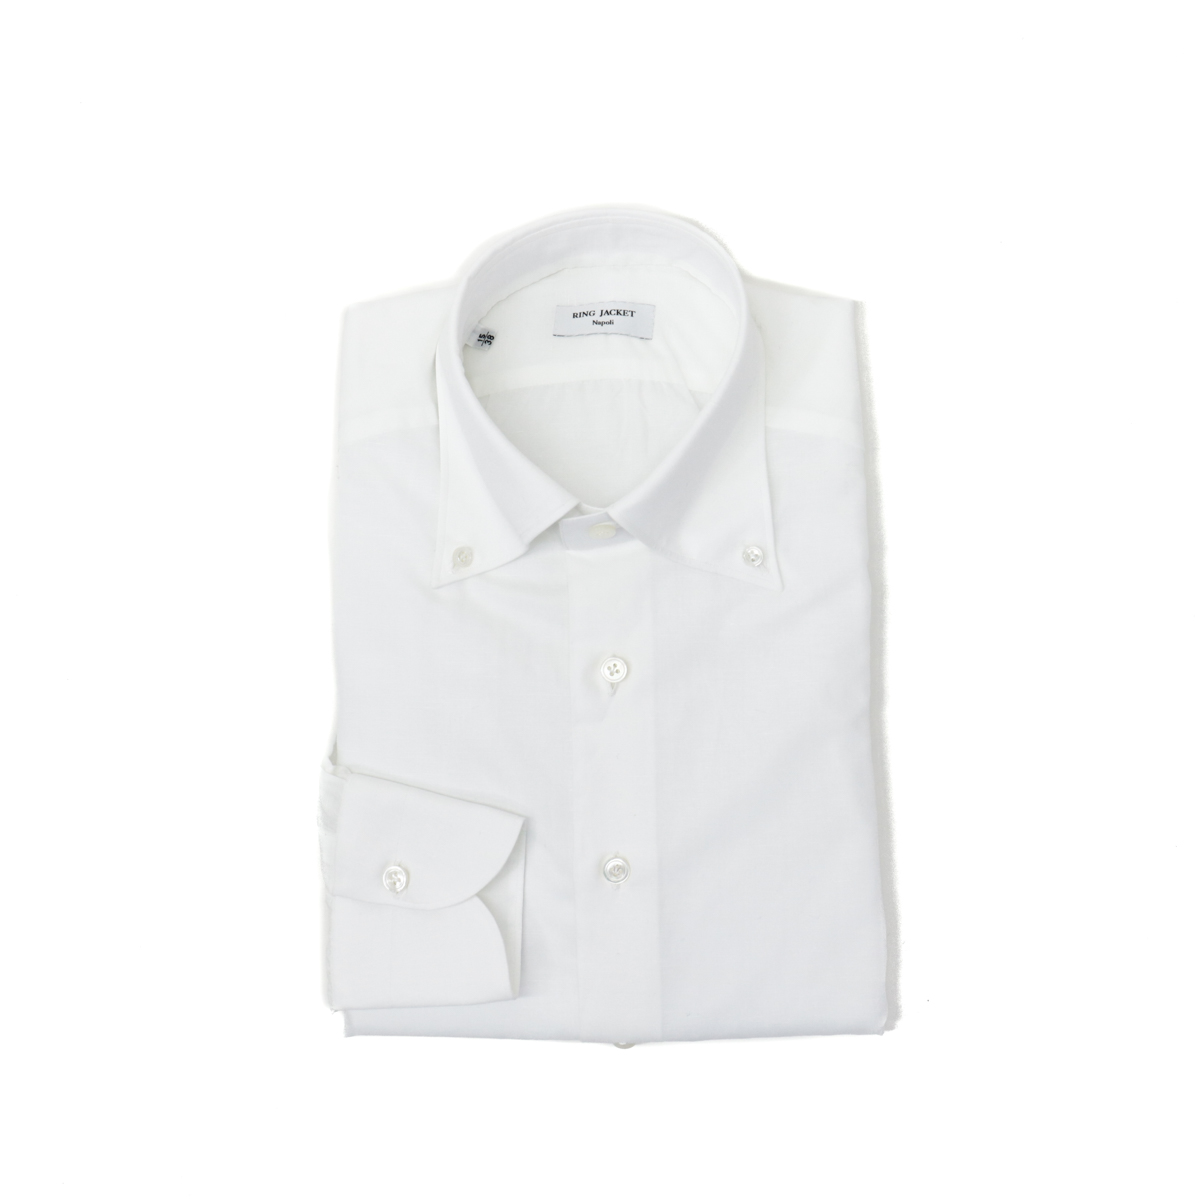 RING JACKET Napoli【リングヂャケット ナポリ】Shirts【シャツ】ボタンダウンカラー【無地 / ホワイト】